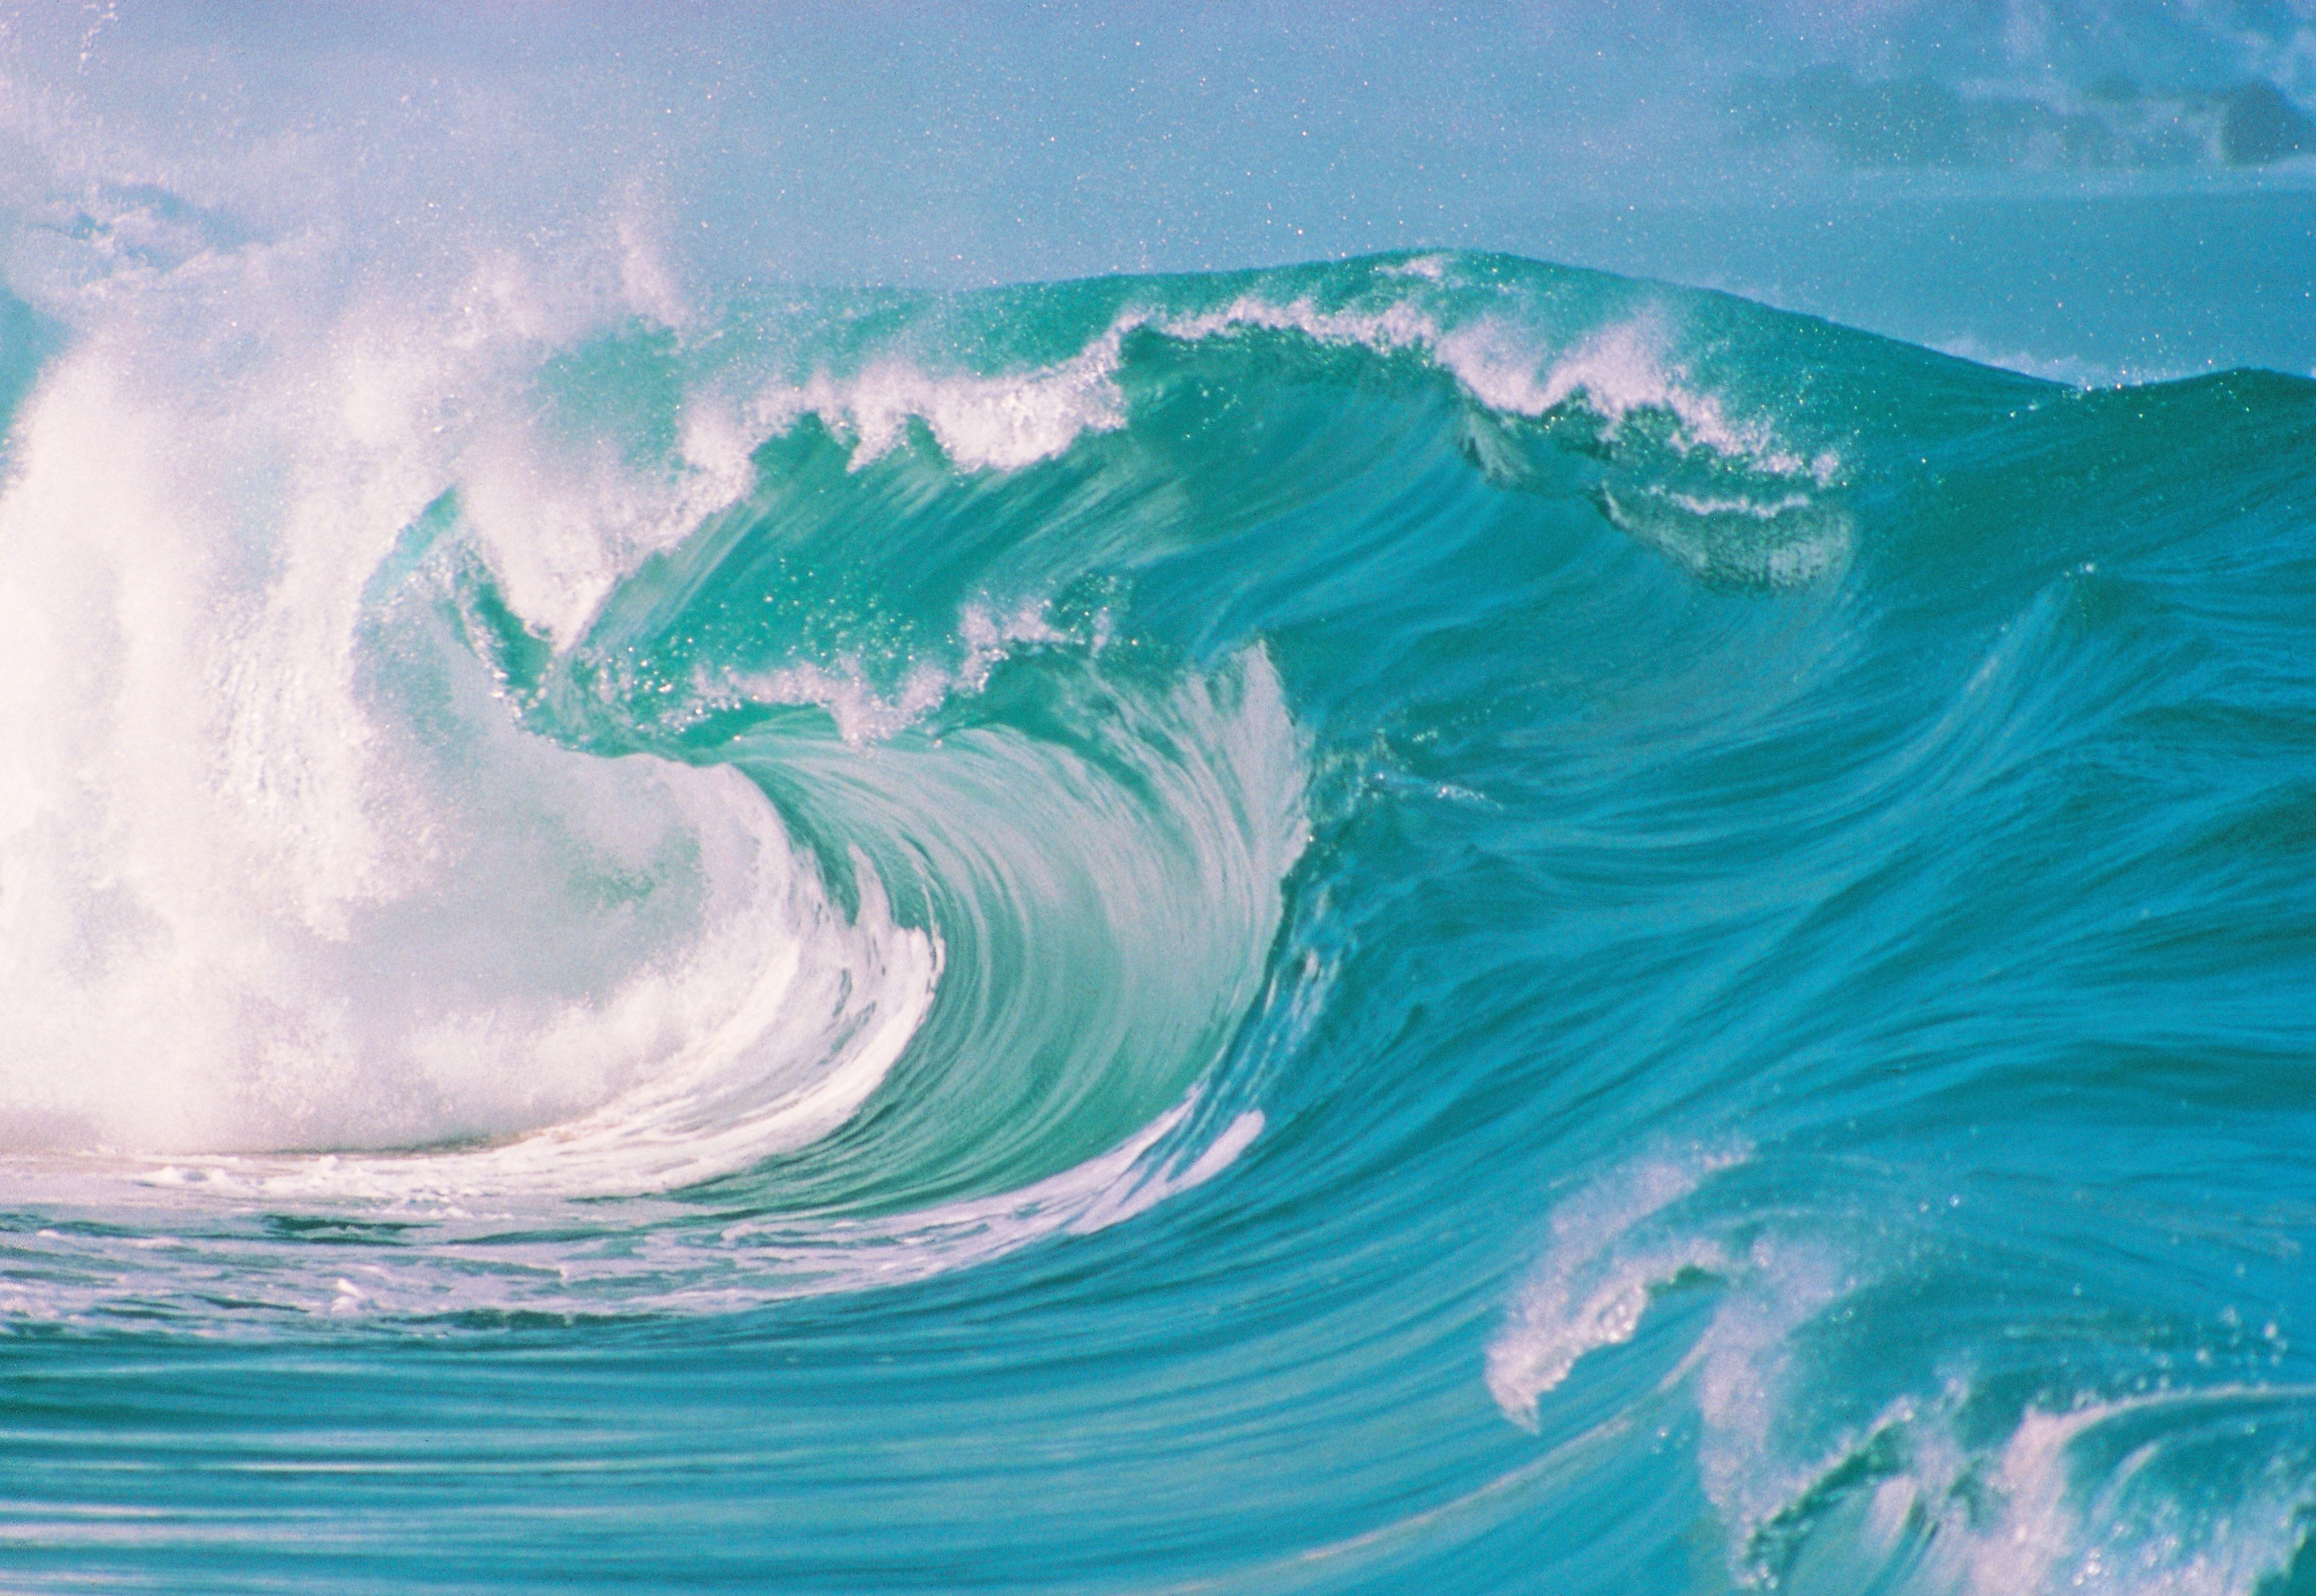 Sea scape nature photography